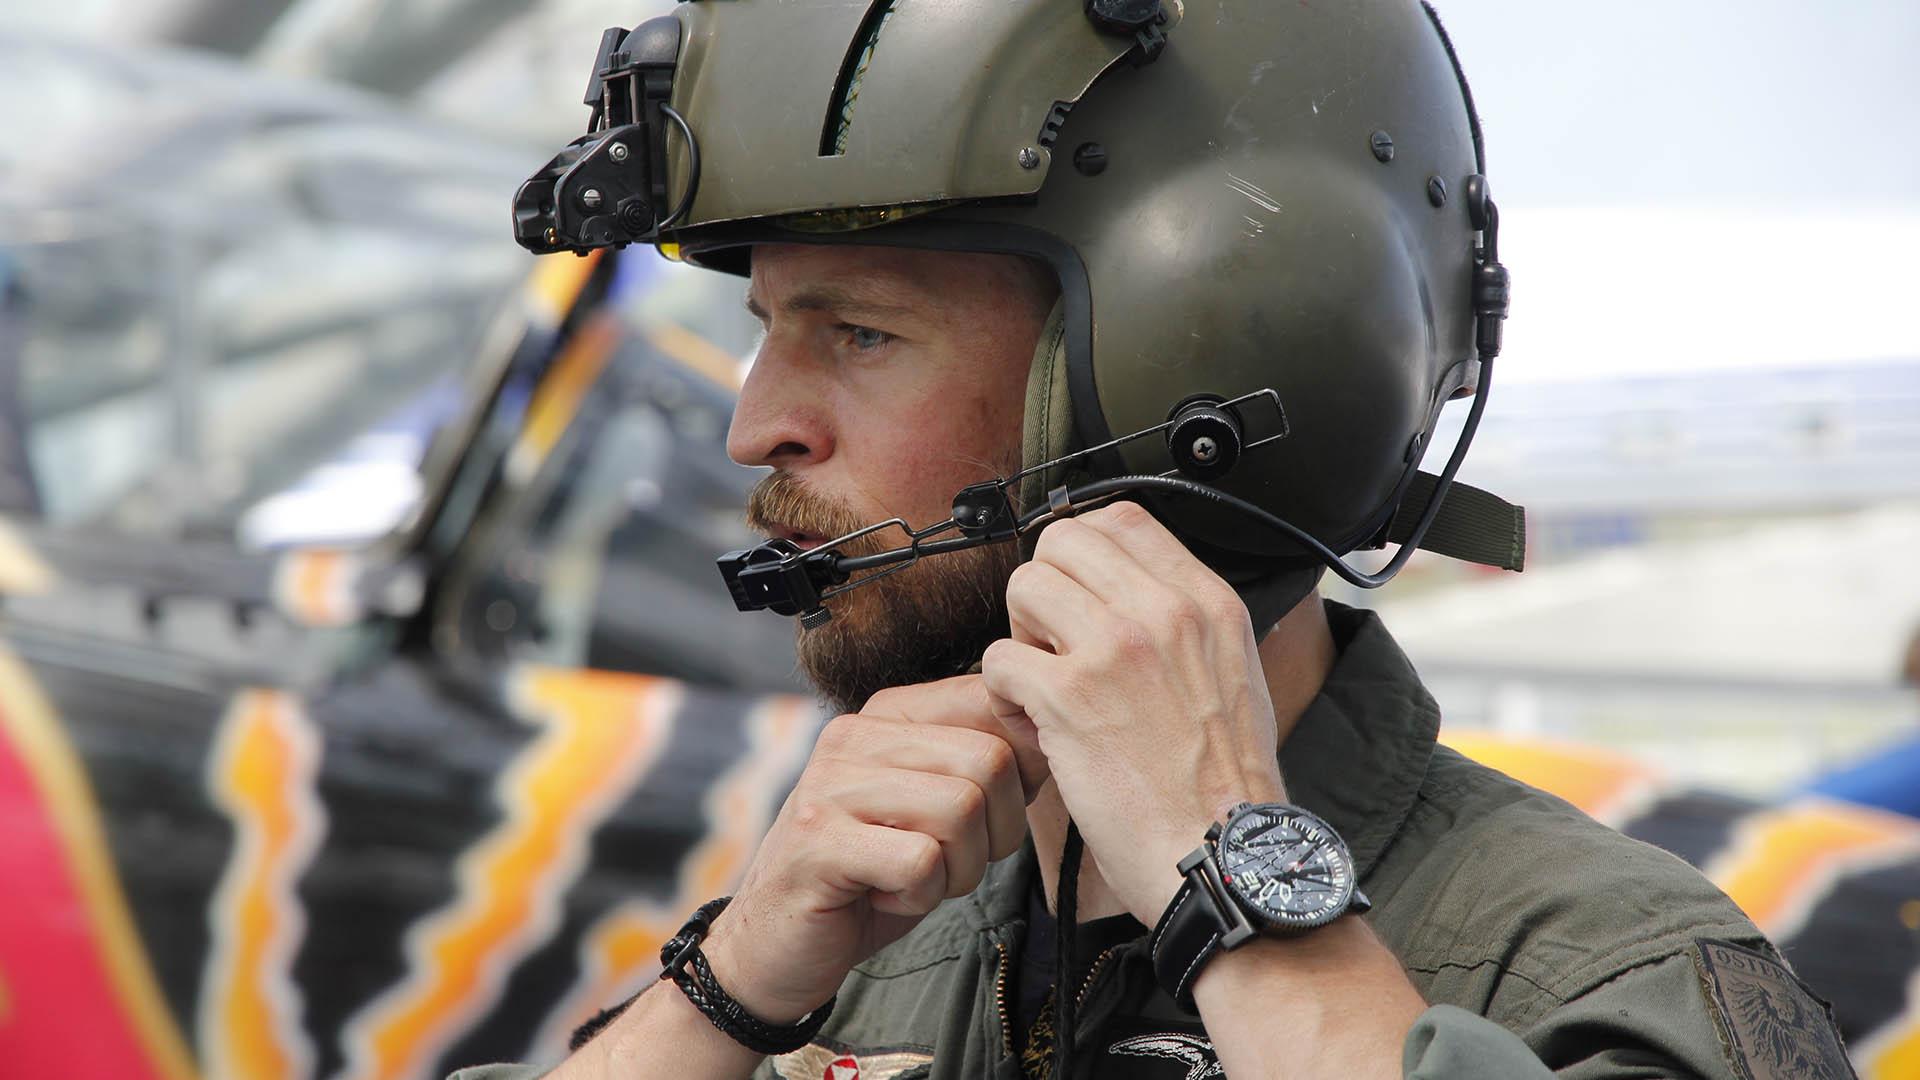 Primus Austrian Air Force Pilot am Arm eines Piloten